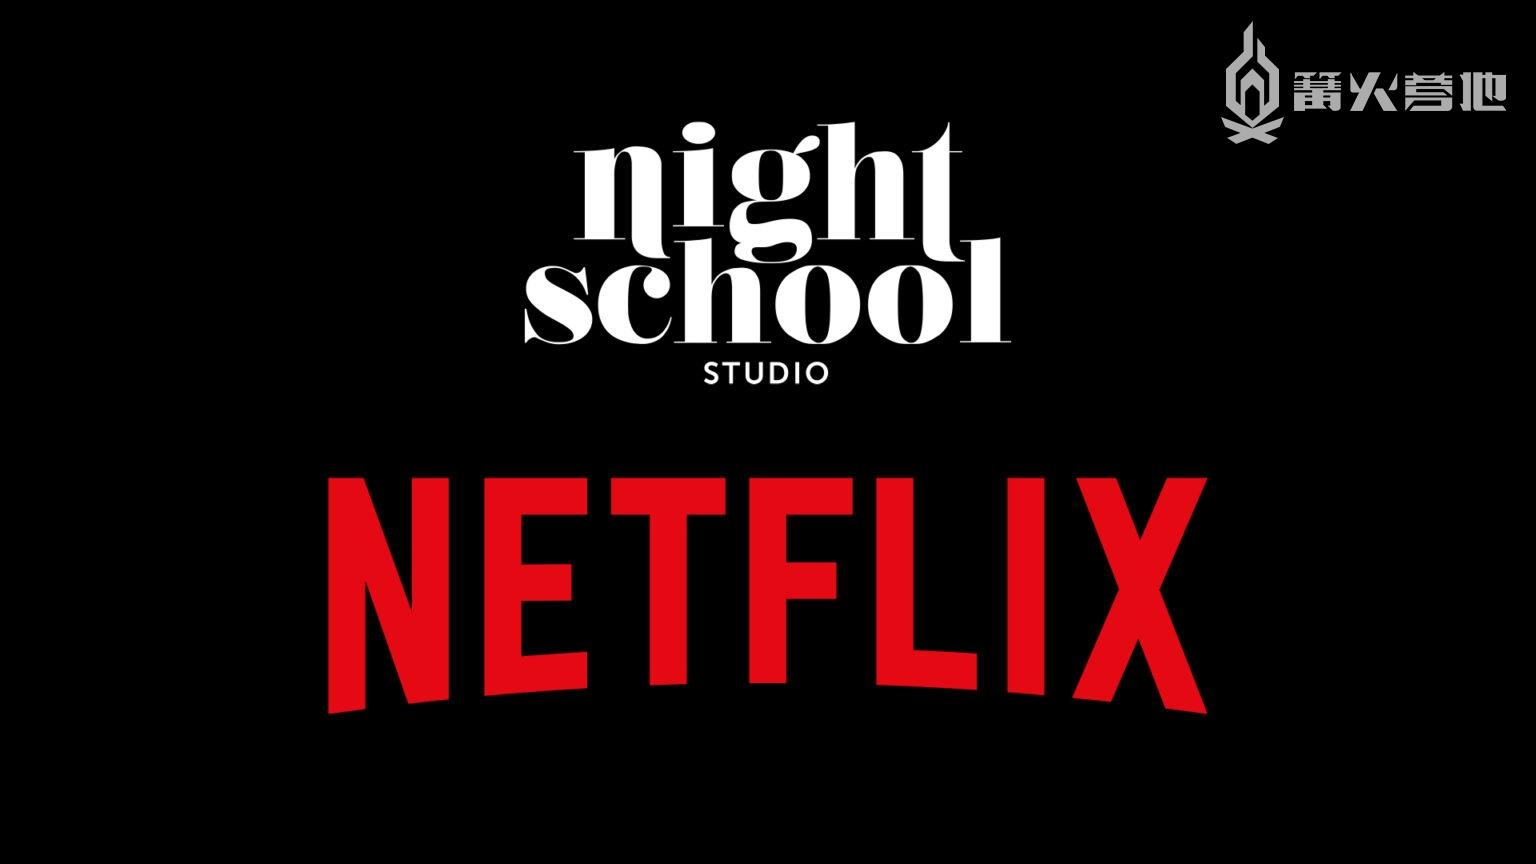 Netflix 宣布收购《奥森弗里》开发商 Night School 工作室